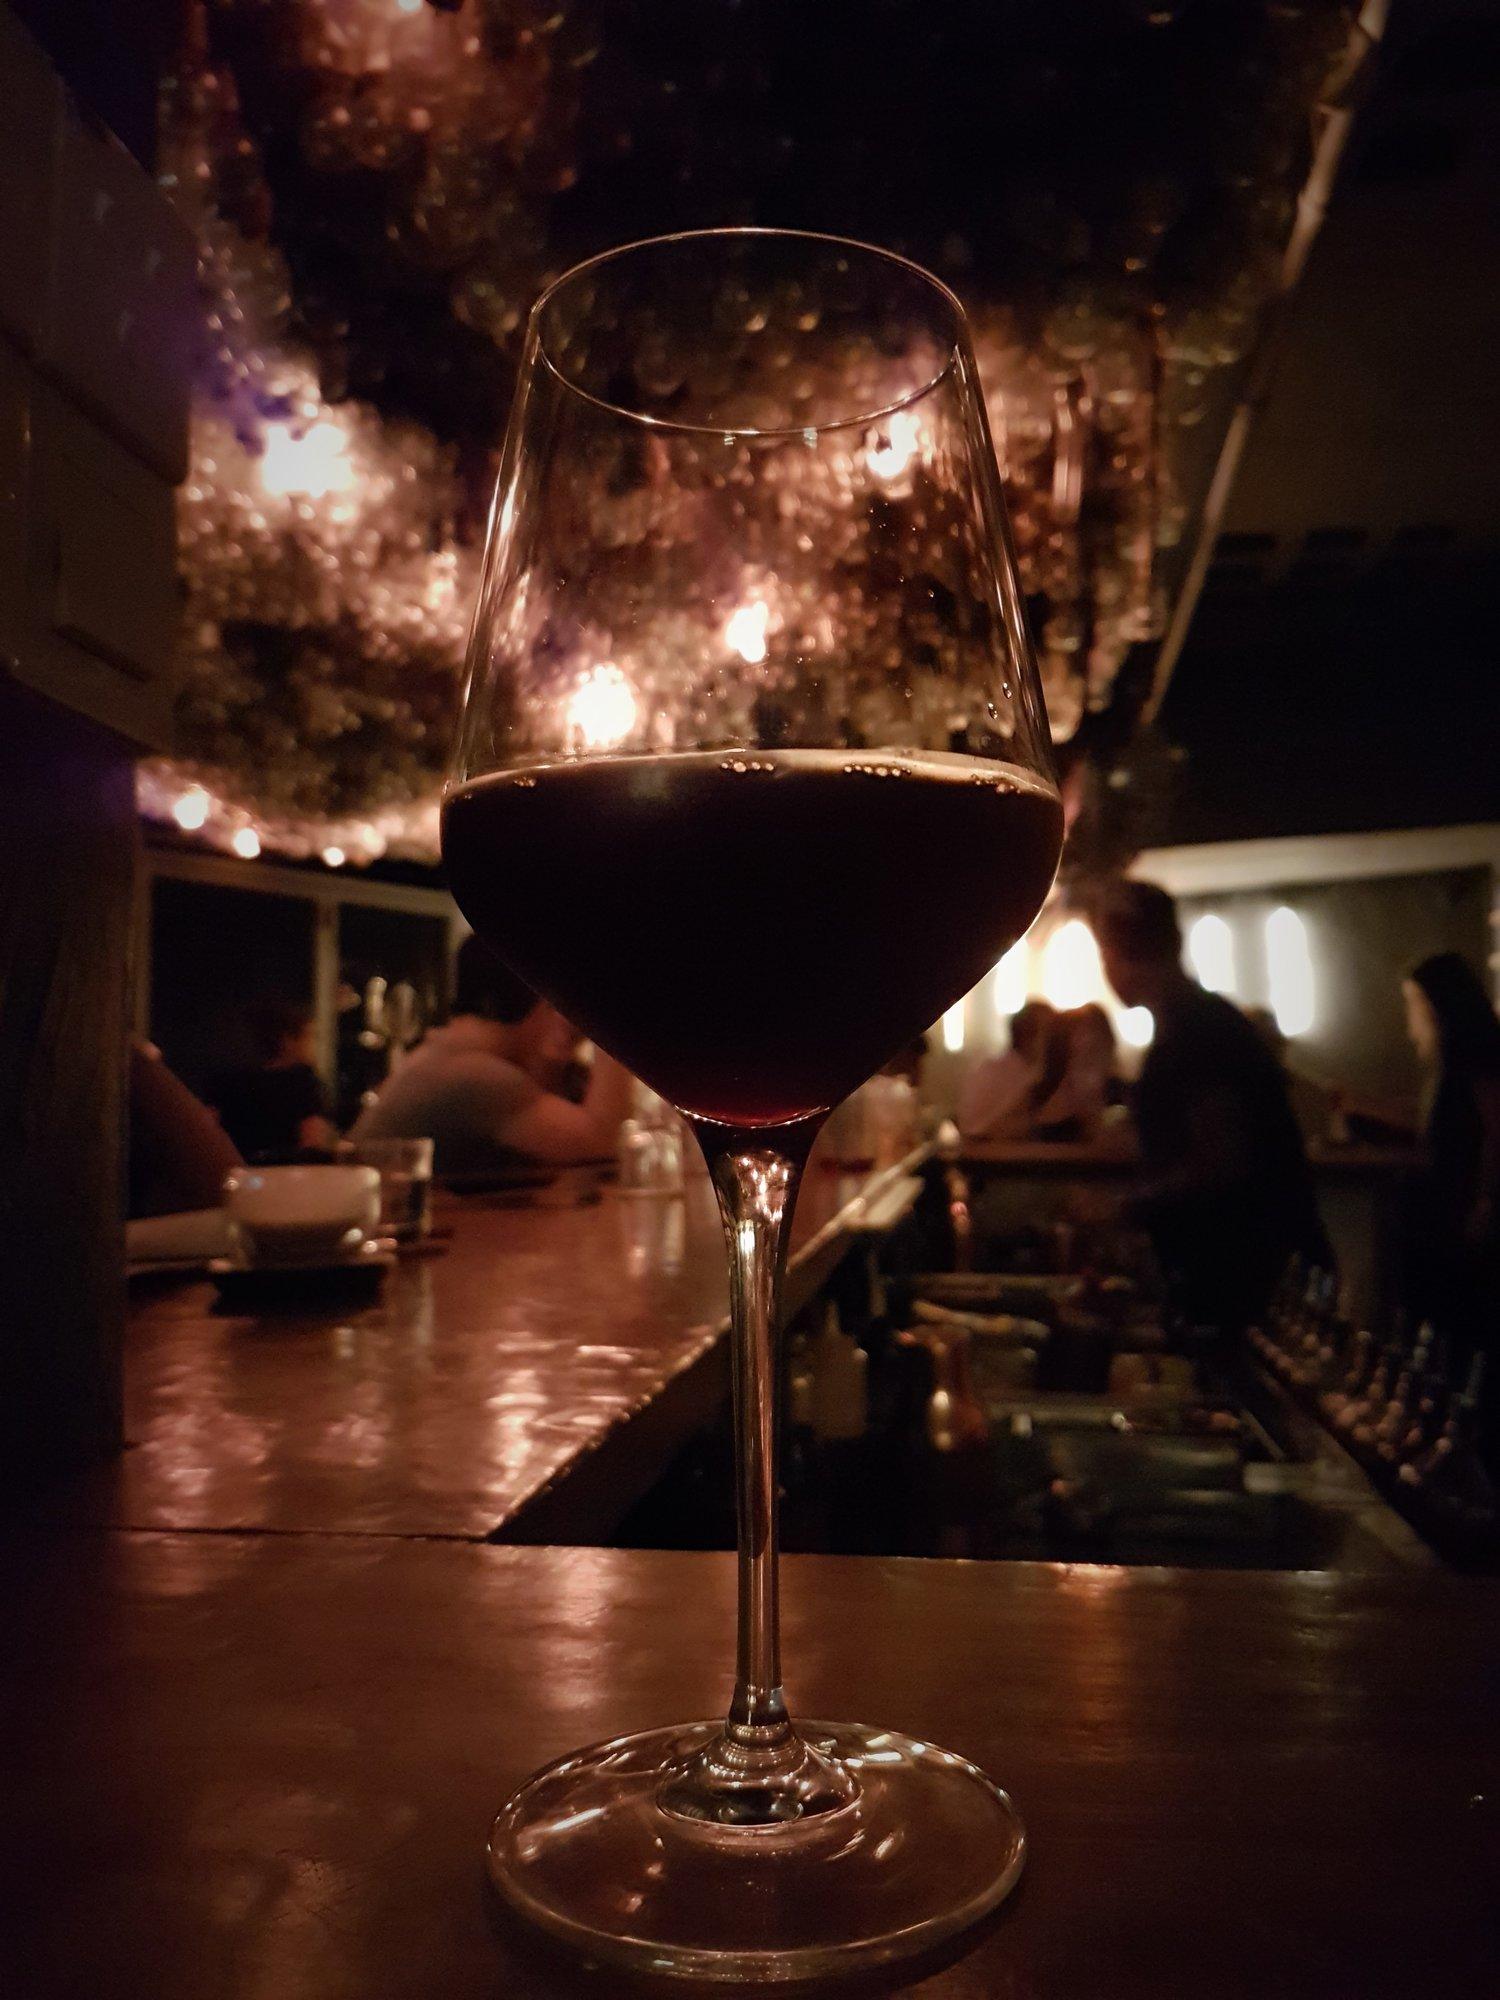 Cabbage wine at Dagger